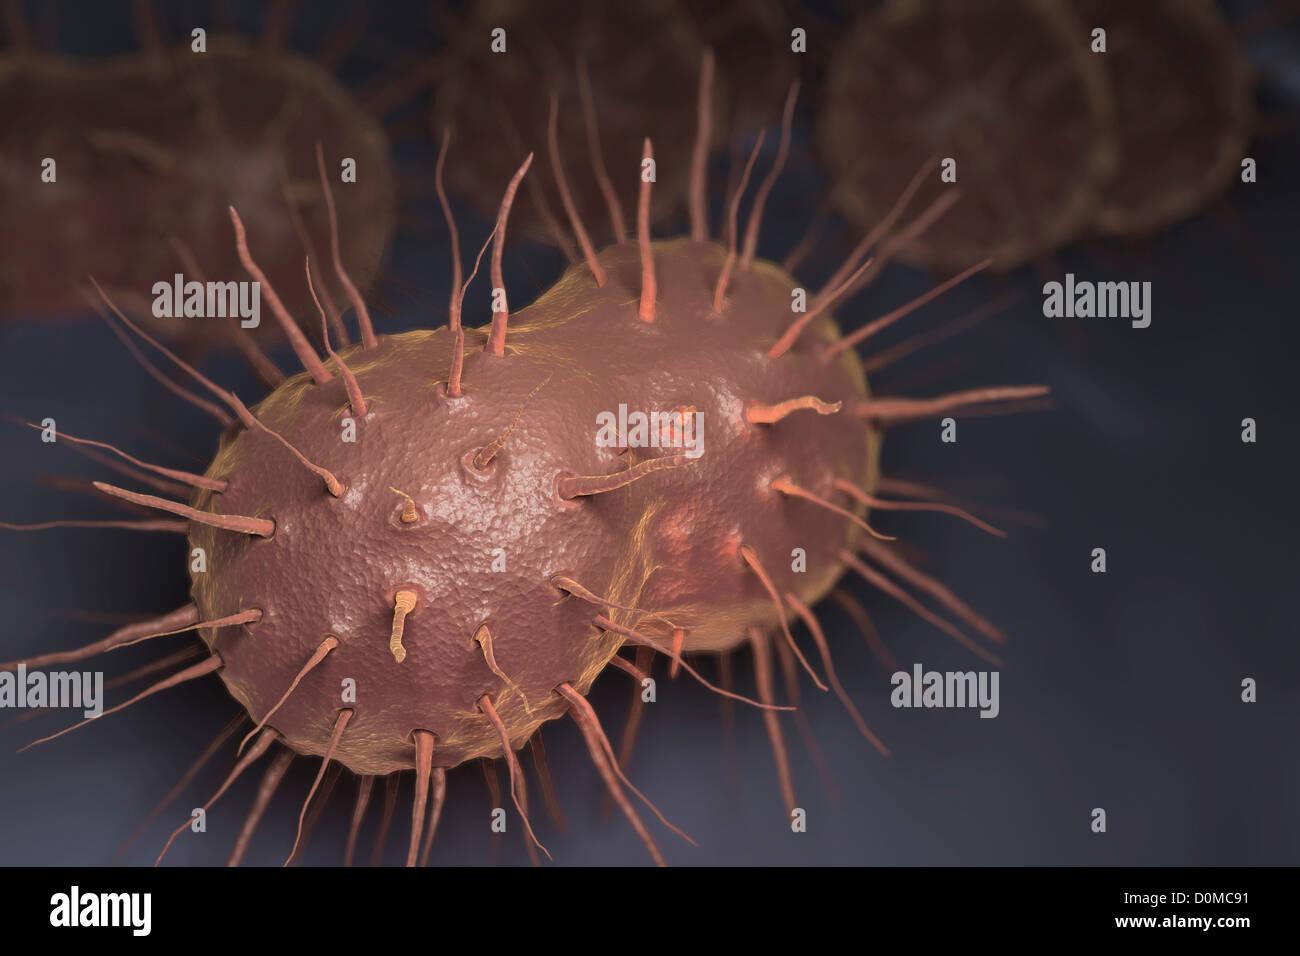 smazka-vlagalisha-pod-mikroskopom